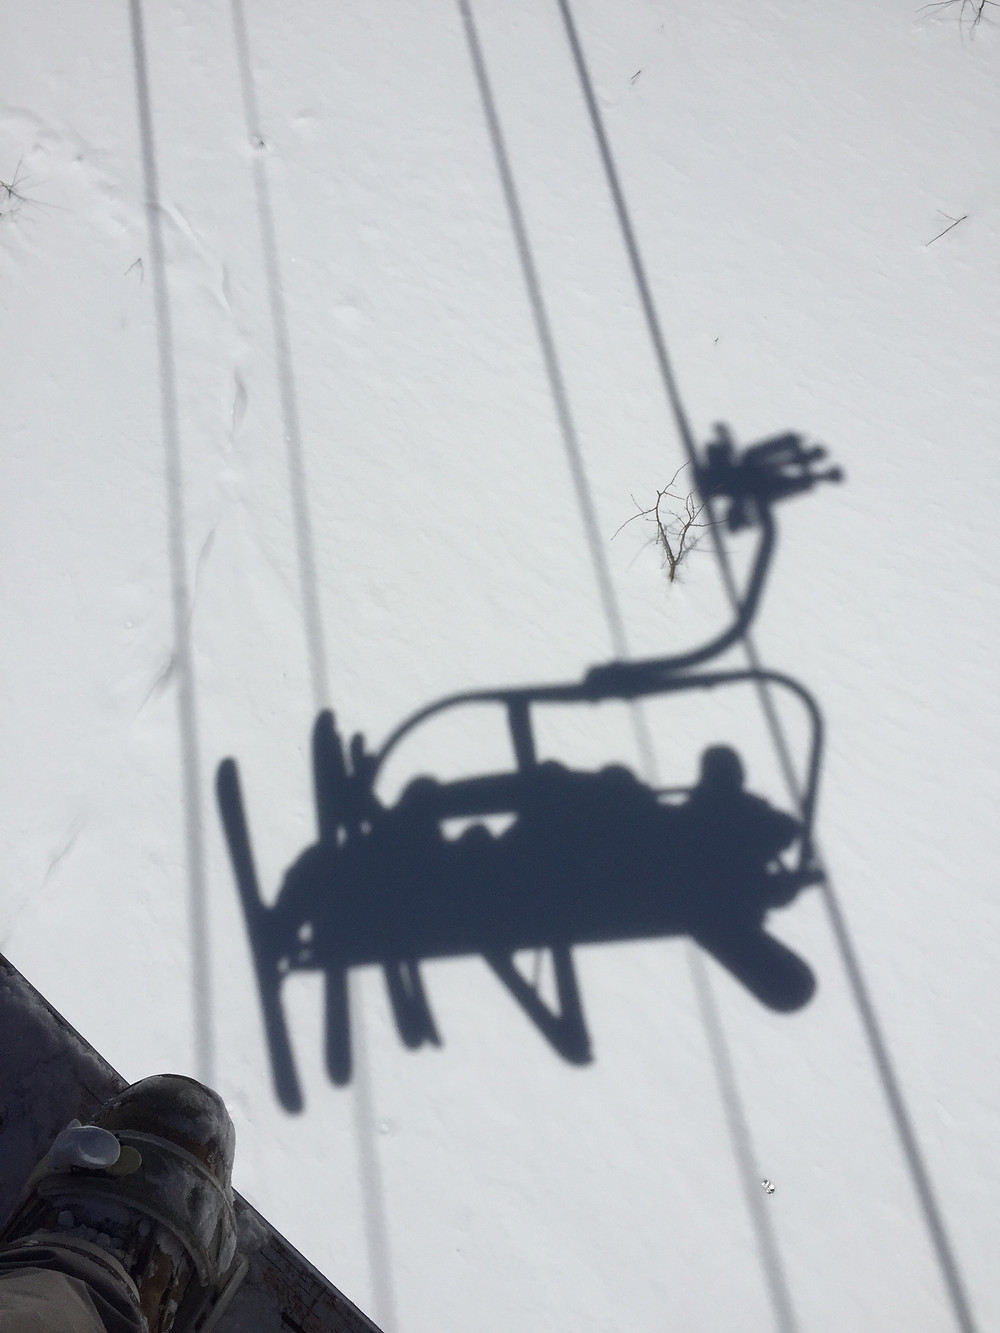 I miss the ski season that was cut short!